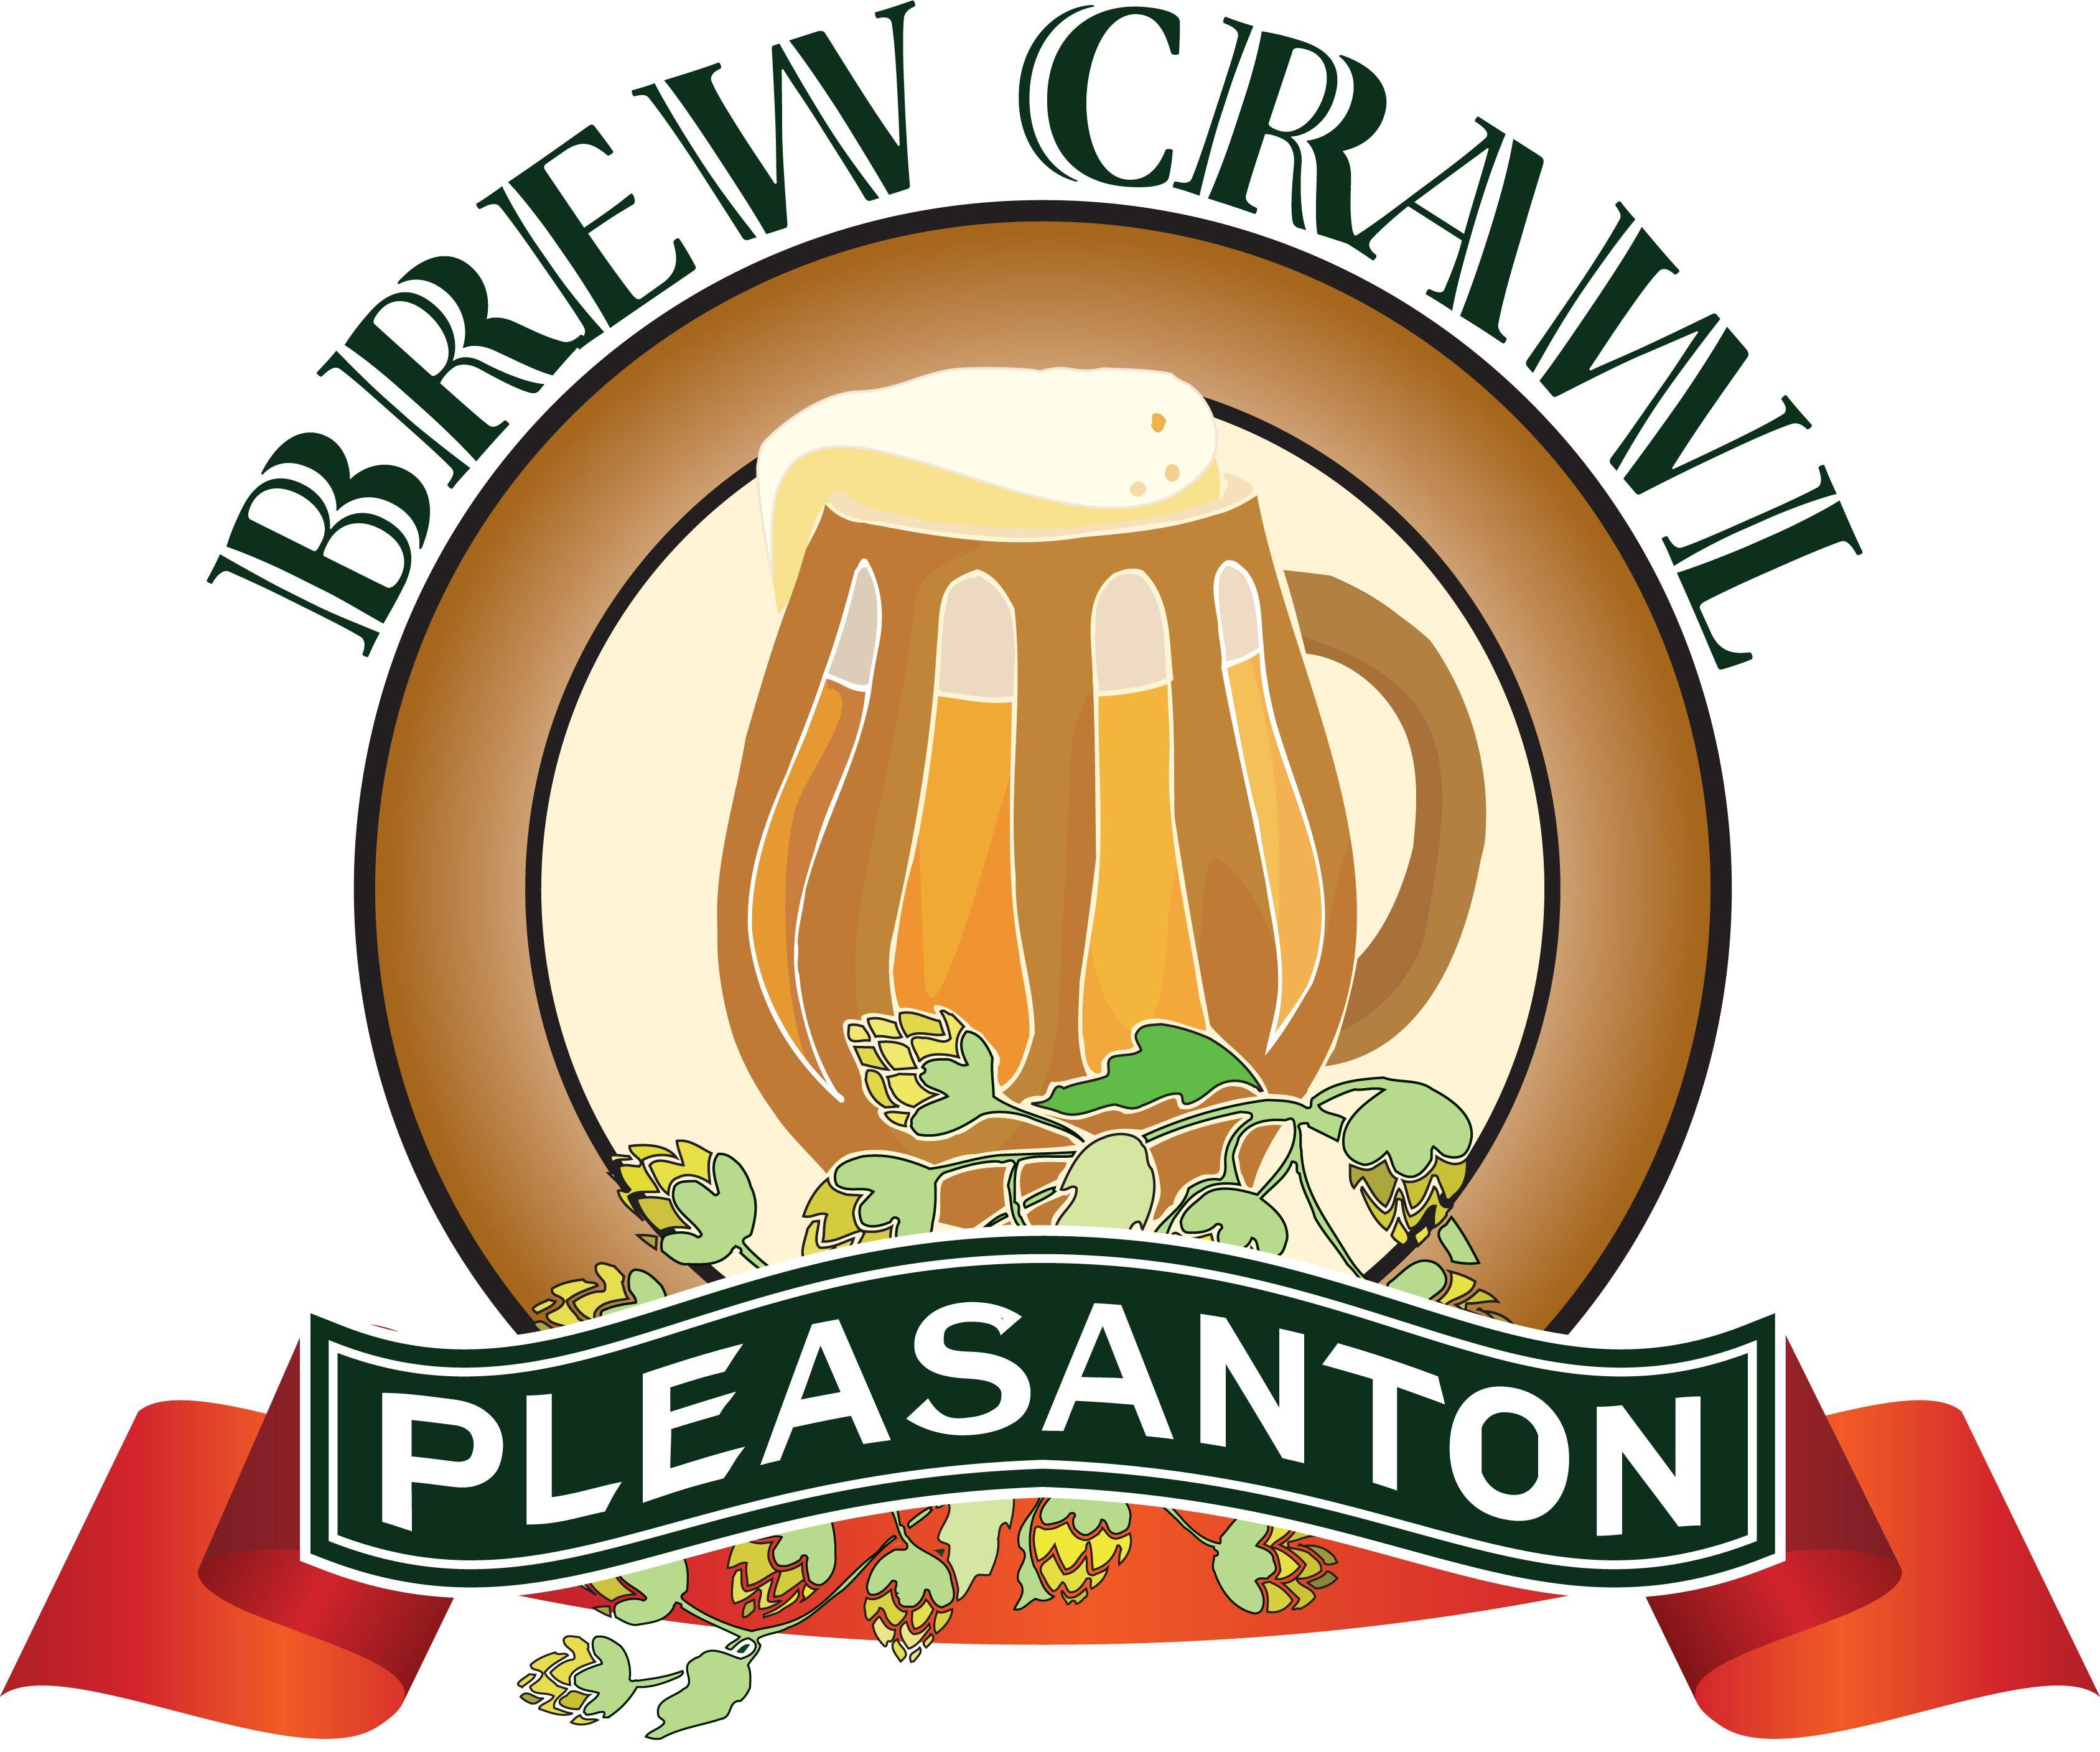 Pleasanton Brew Crawl! Don\'t miss this fun event on Oct. 26.